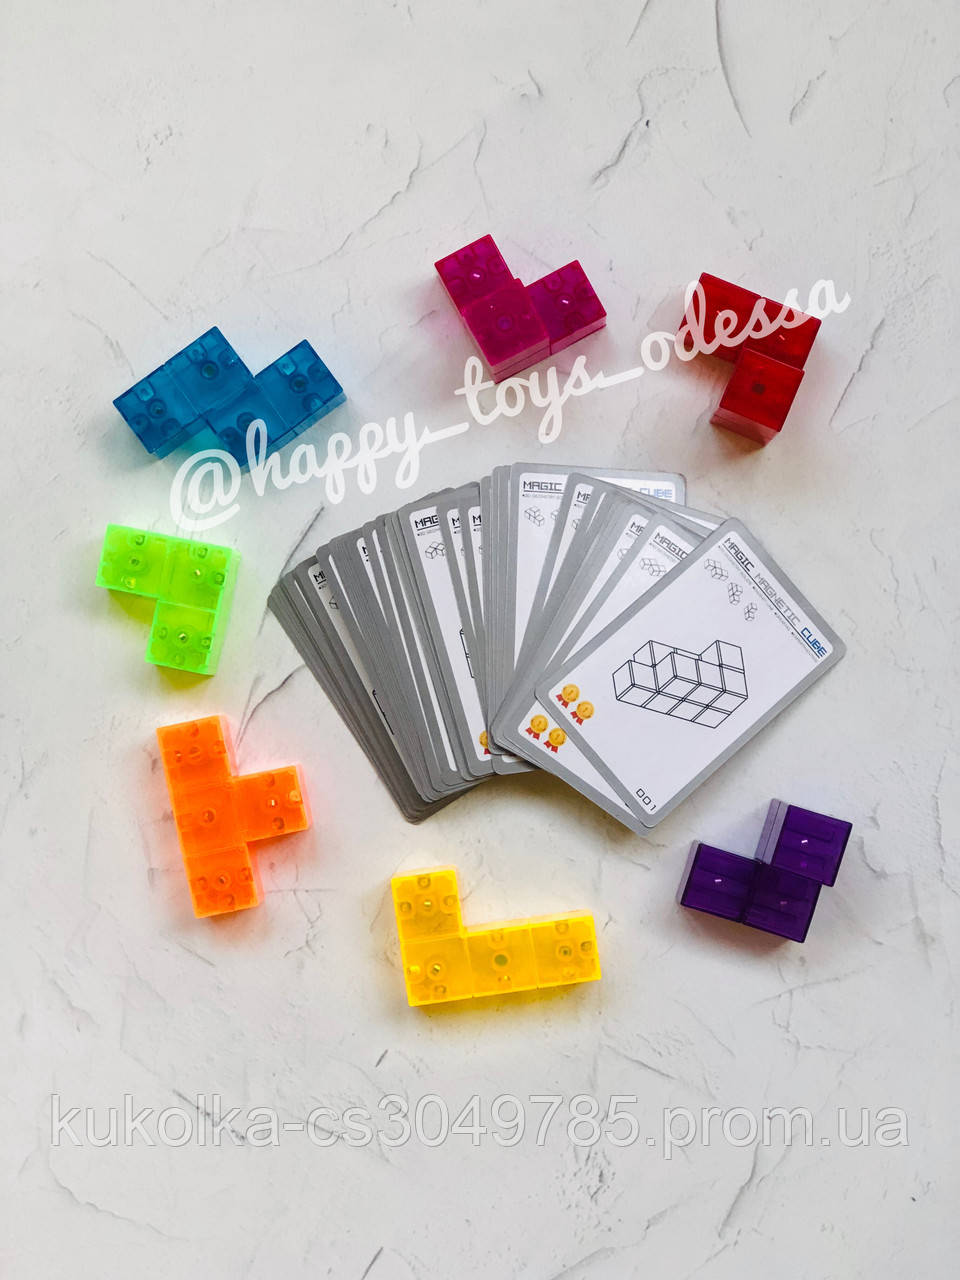 Магнитный тетрис-куб ( 54 карточки с заданиями ), фото 1